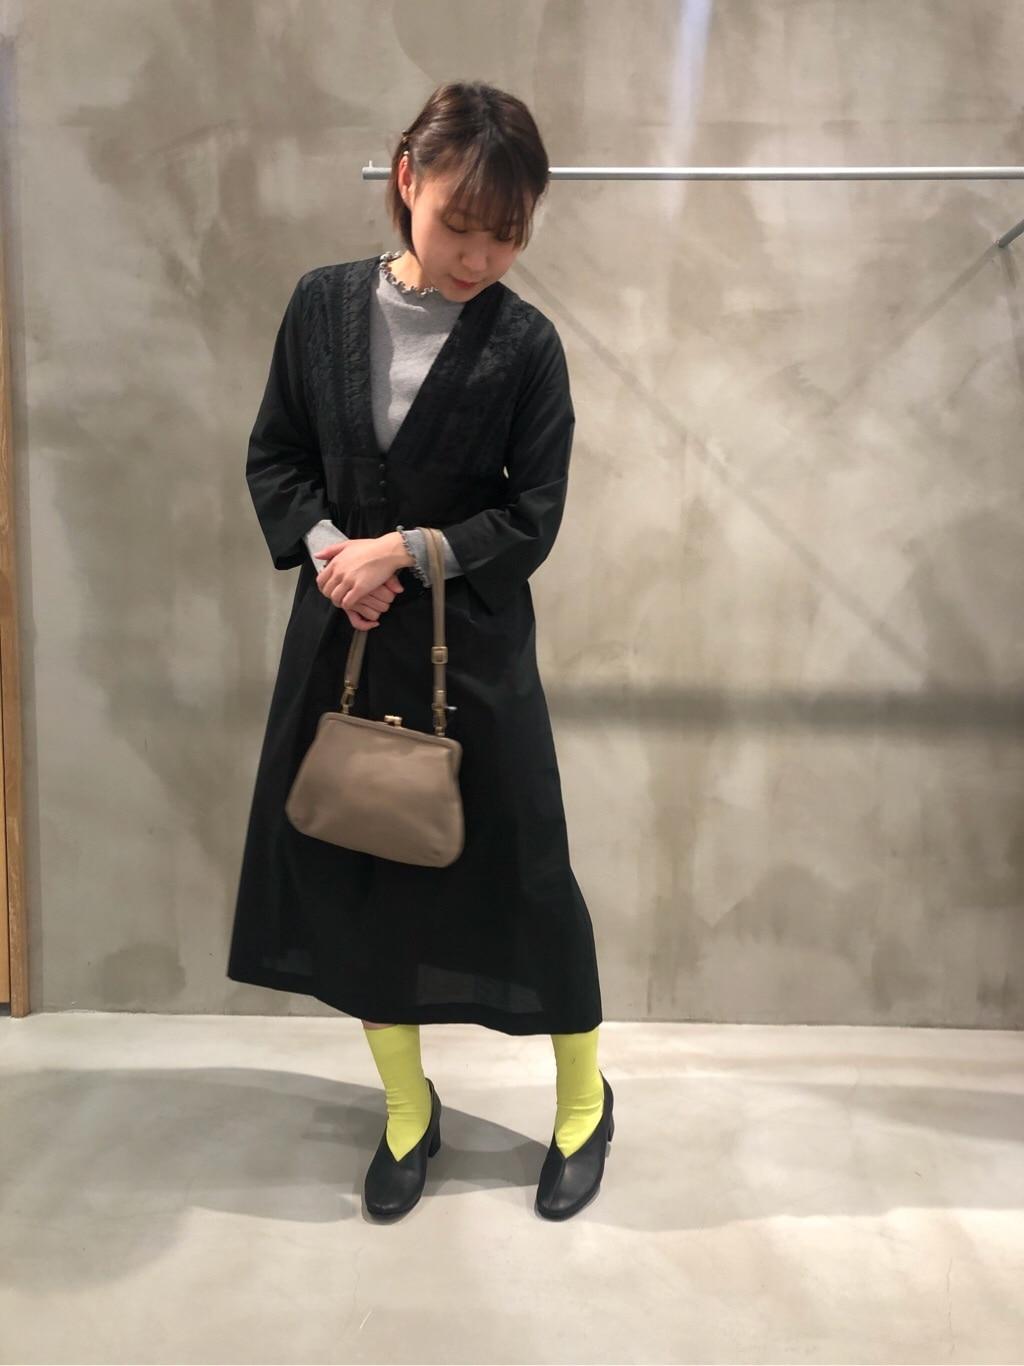 bulle de savon 渋谷スクランブルスクエア 身長:159cm 2020.03.18